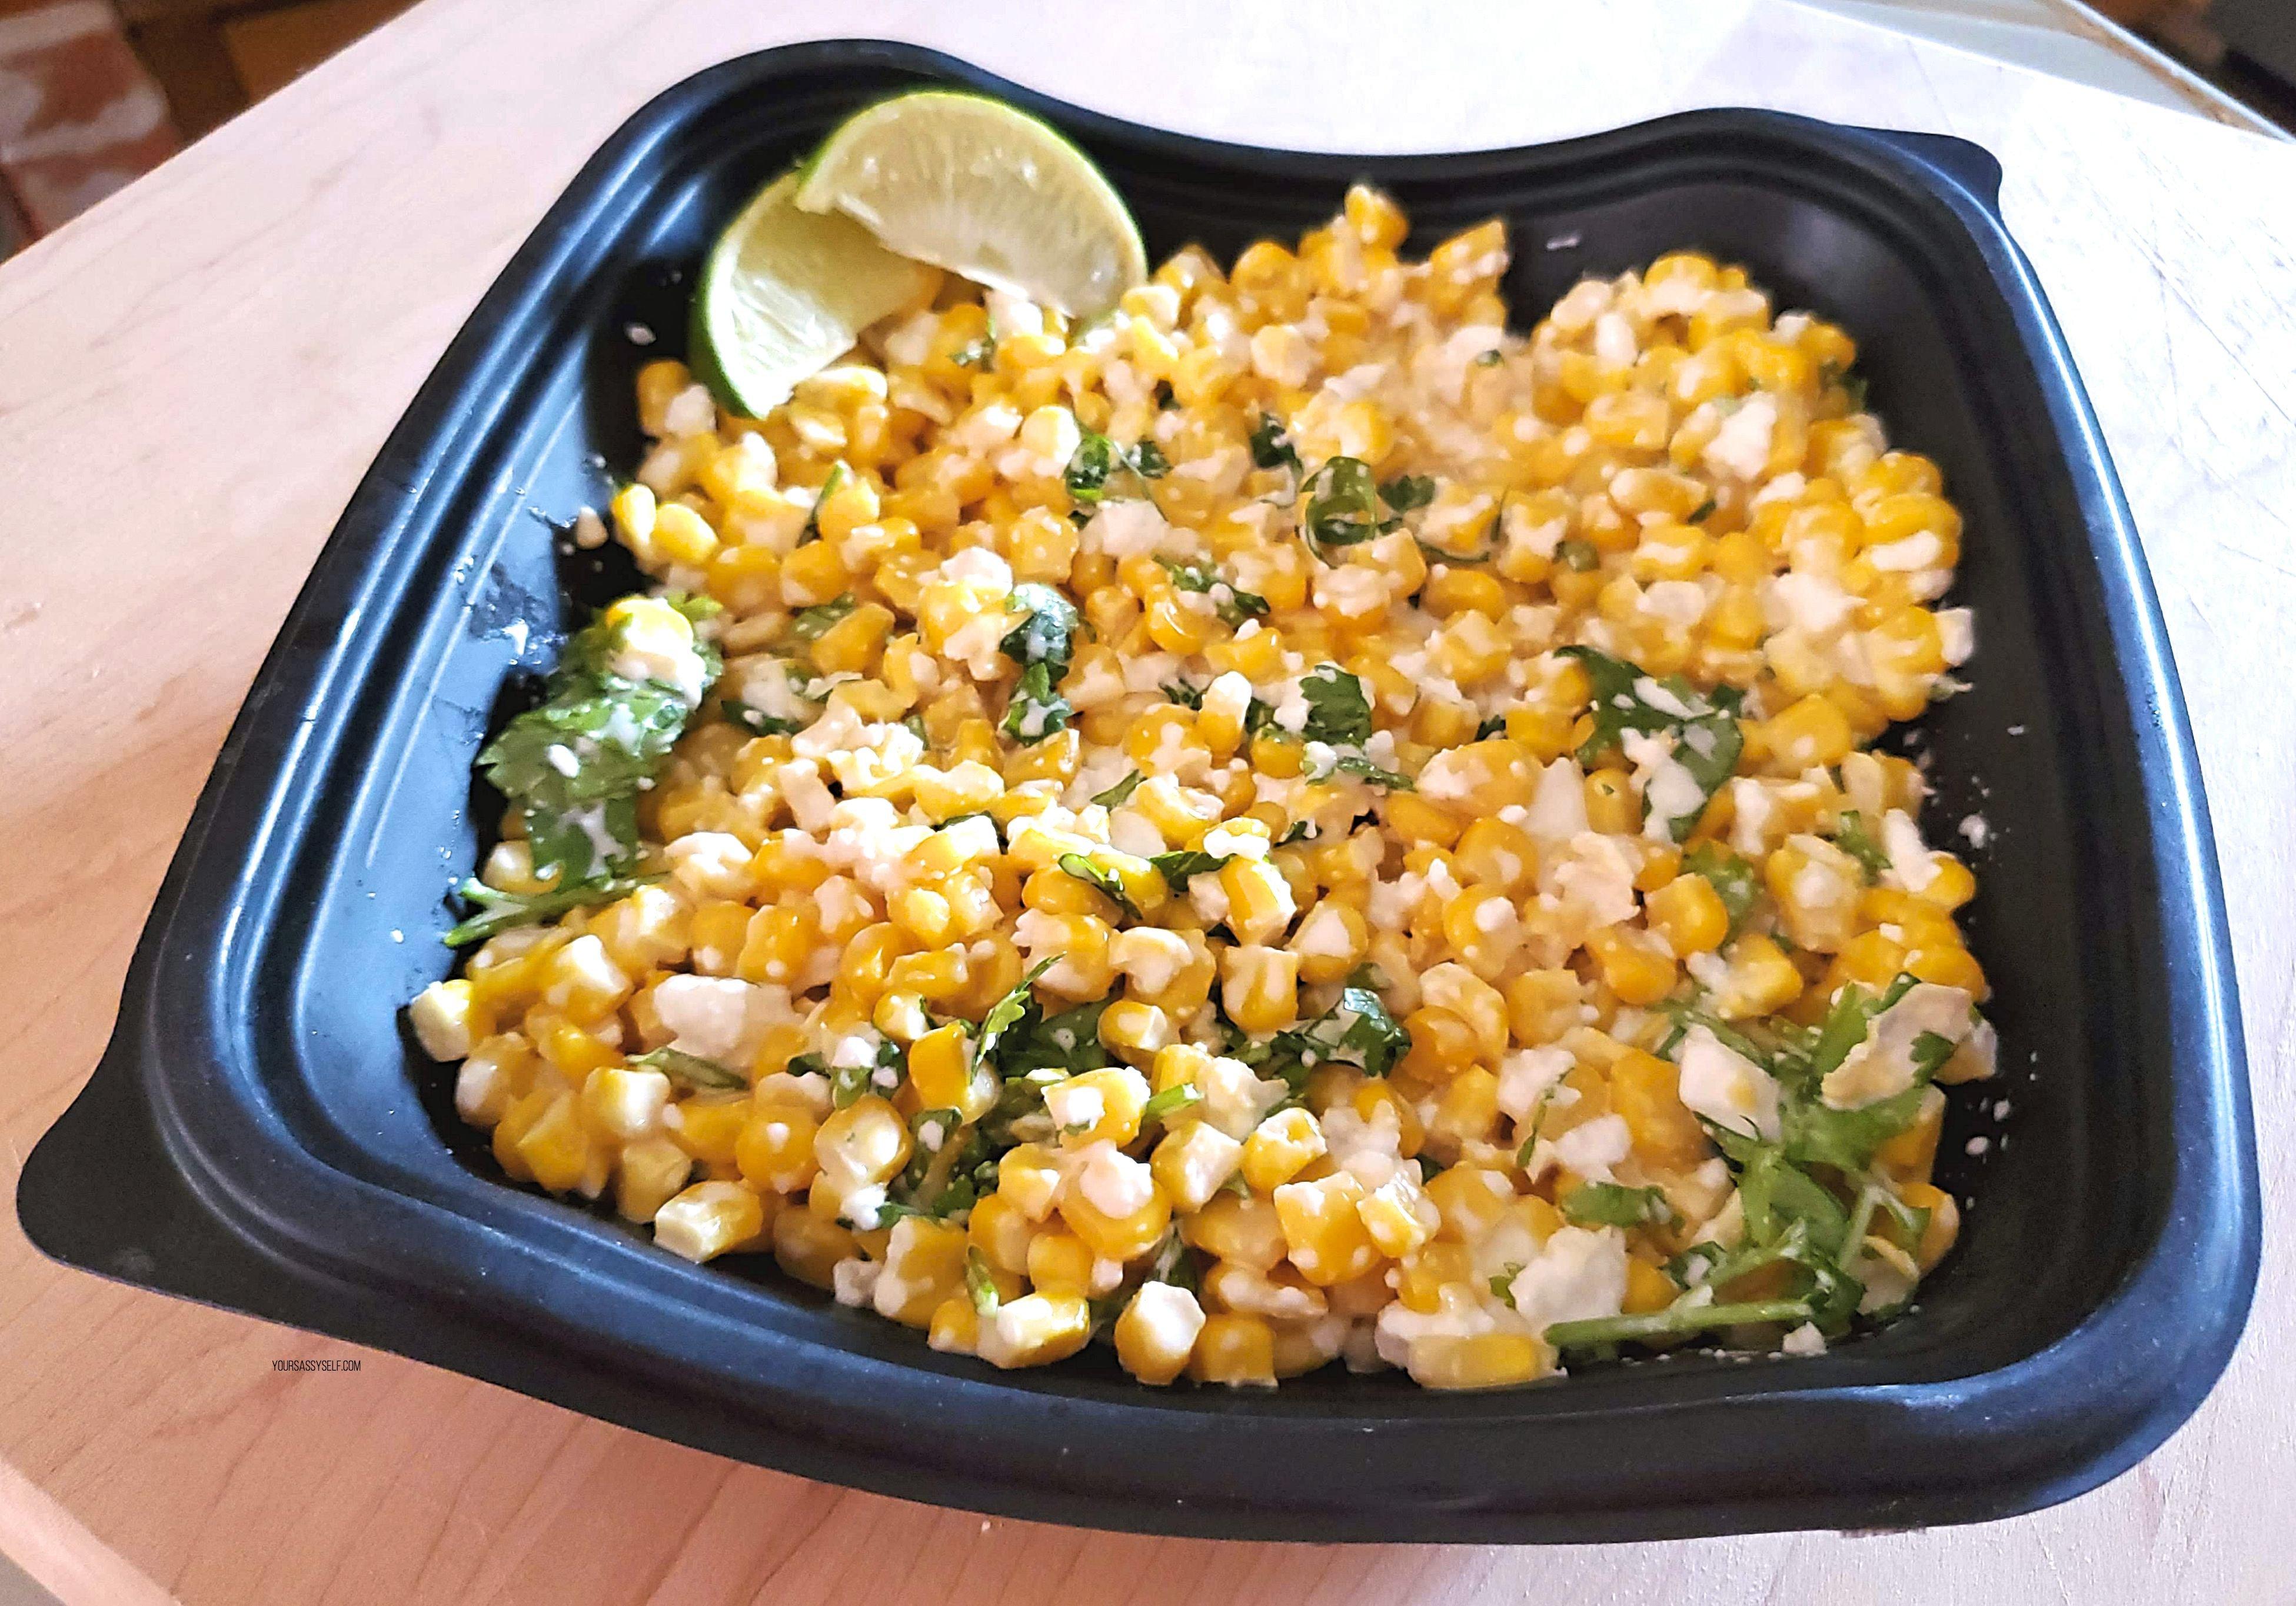 Mexican Street Corn and Limes - yoursassyself.com